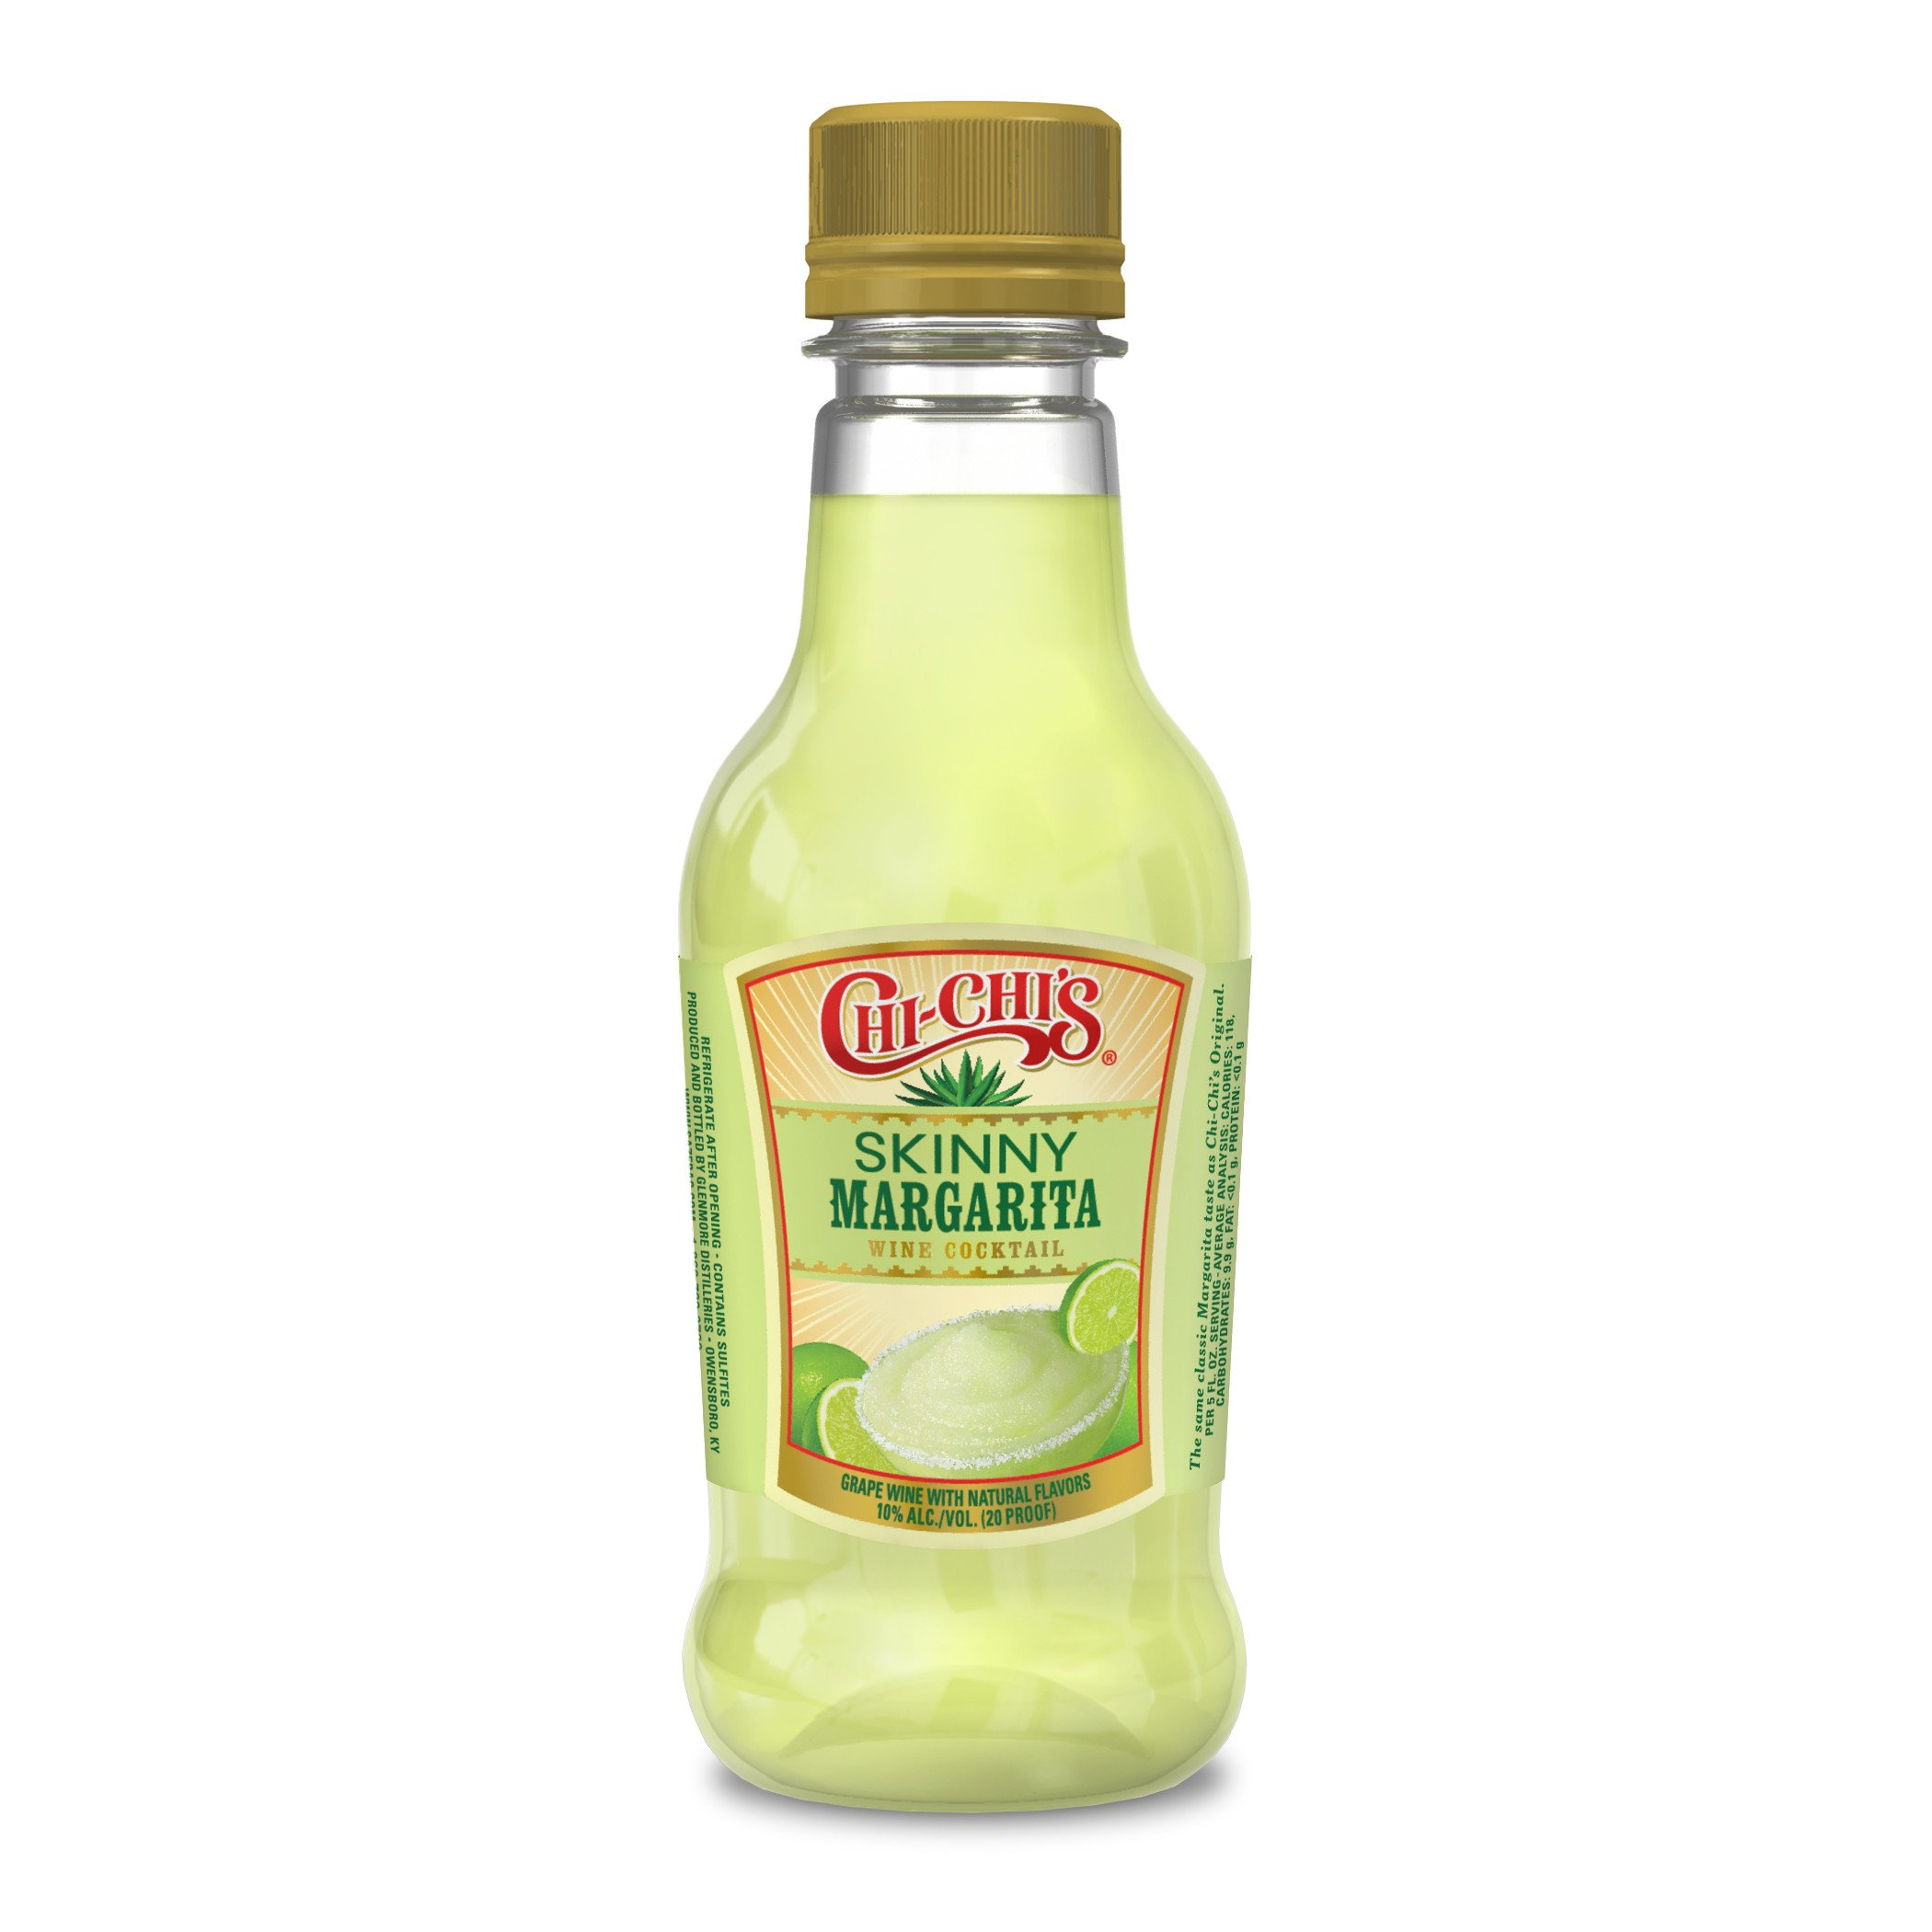 Chi-Chi's Skinny Margarita Wine Cocktail